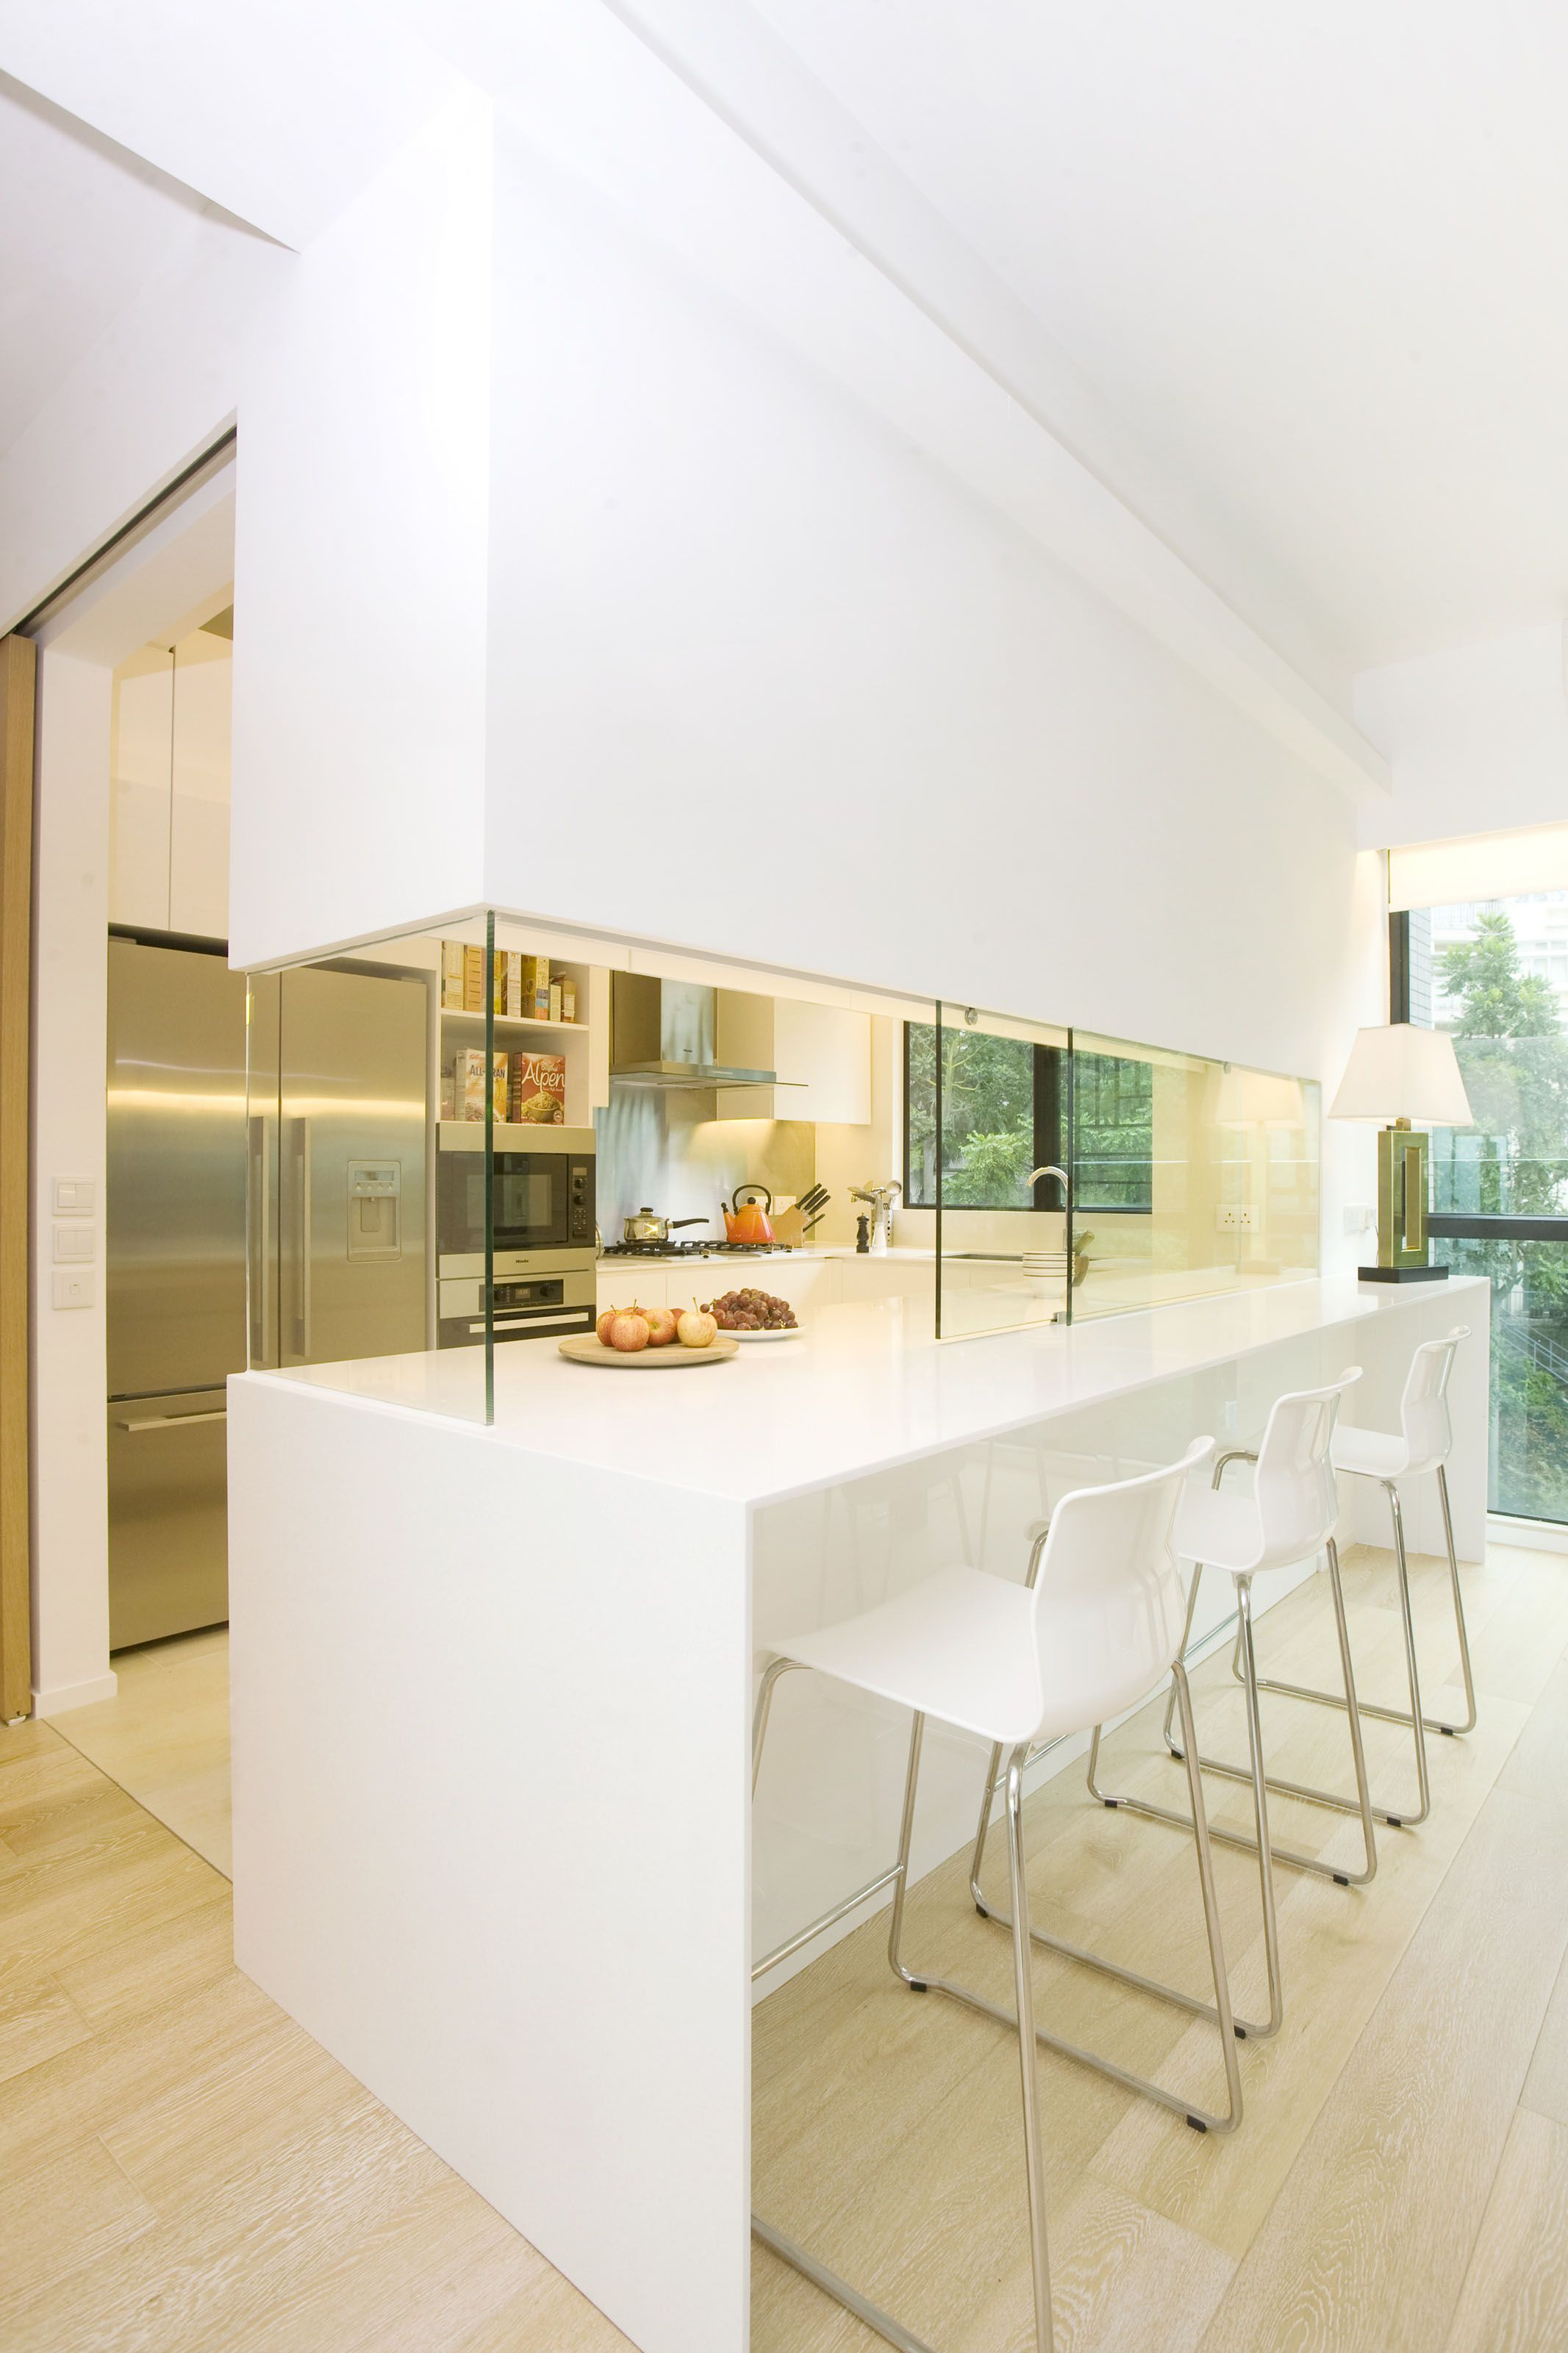 Semi-open Kitchen ║ Sliding-glass Panel ║ Spacious ║ Countertop ...